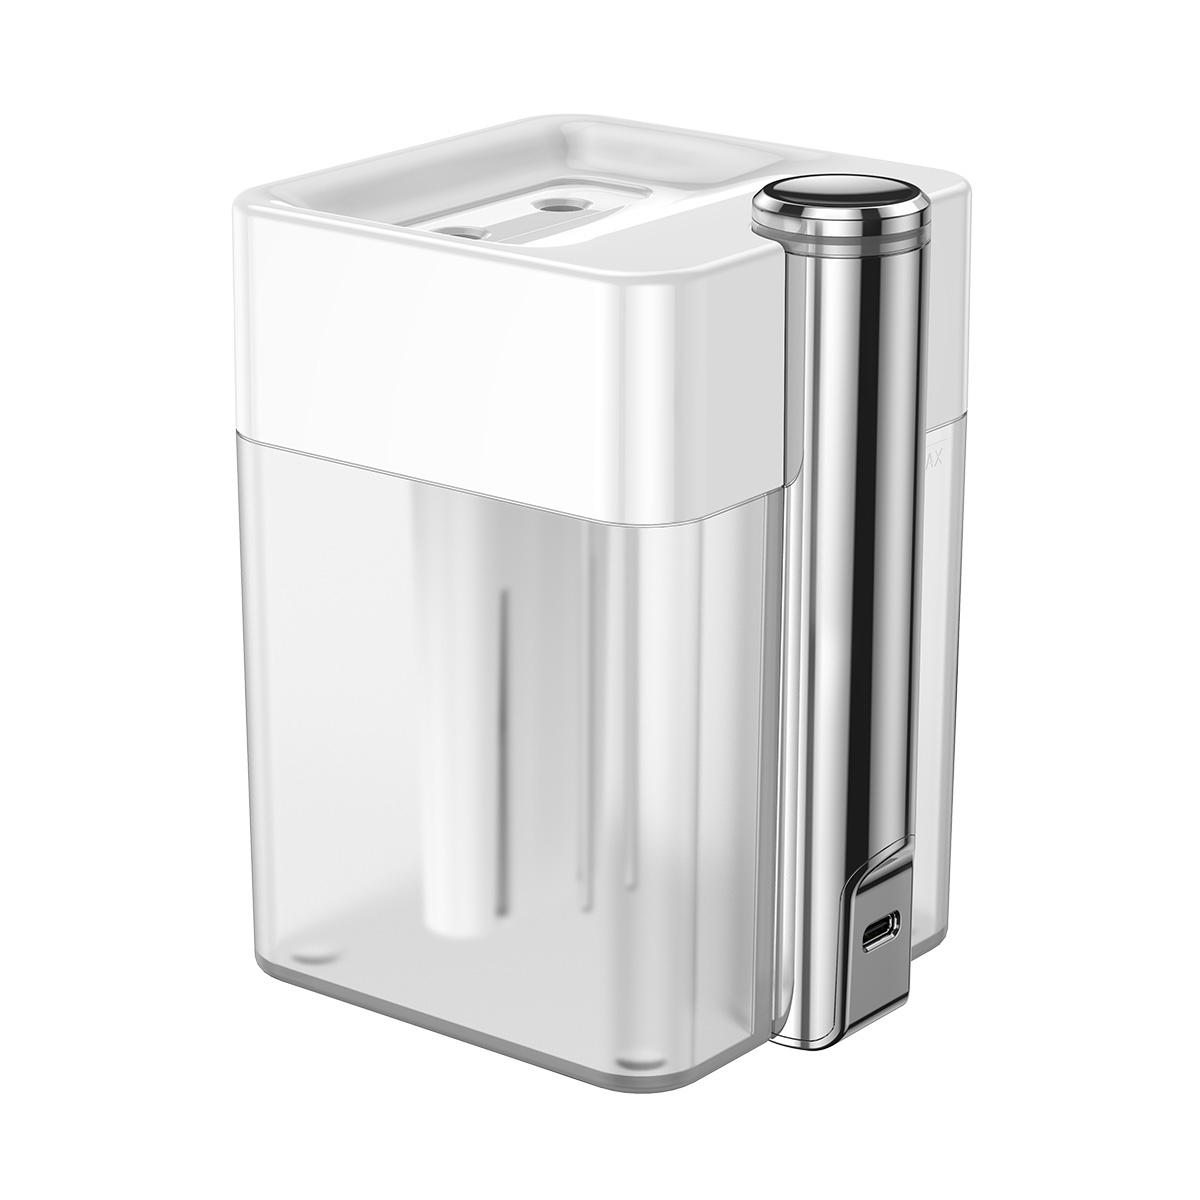 Baseus DHSG-B02 Time Magic Box luftfuktare, 550ml, 2000mAh